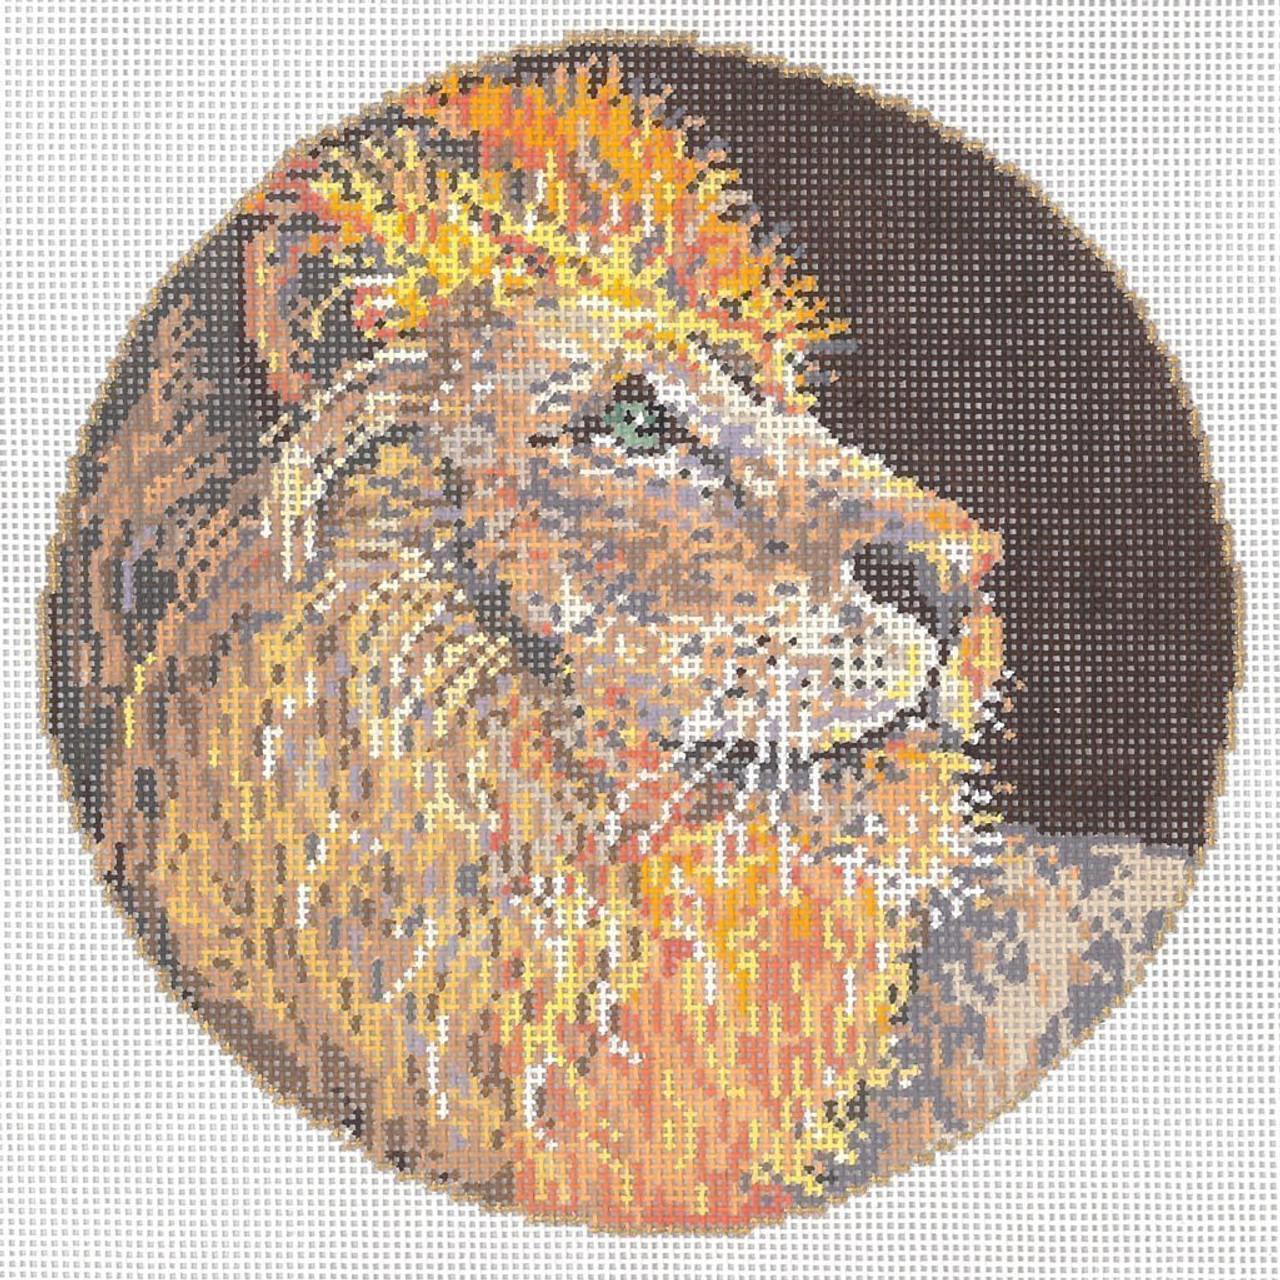 f00d3097855d7 The King 6.25 dia. 18 Mesh Once In A Blue Moon By Sandra Gilmore 18-1085 -  The NeedleArt Closet